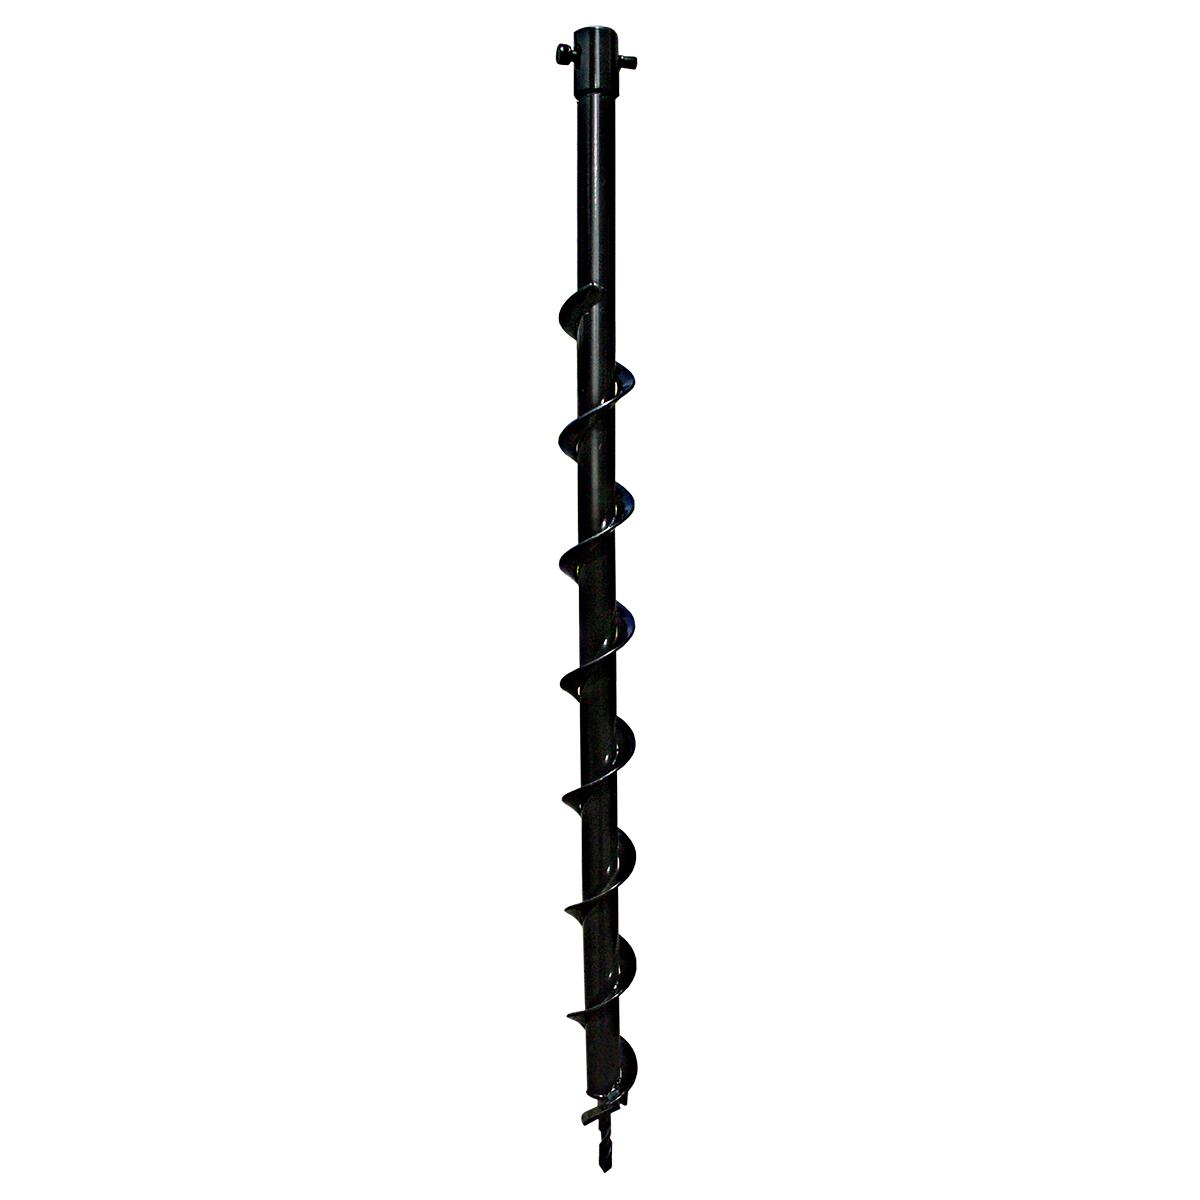 Шнек для мотобура ADA Drill 40/800 ada instruments ada drill 150 80 см